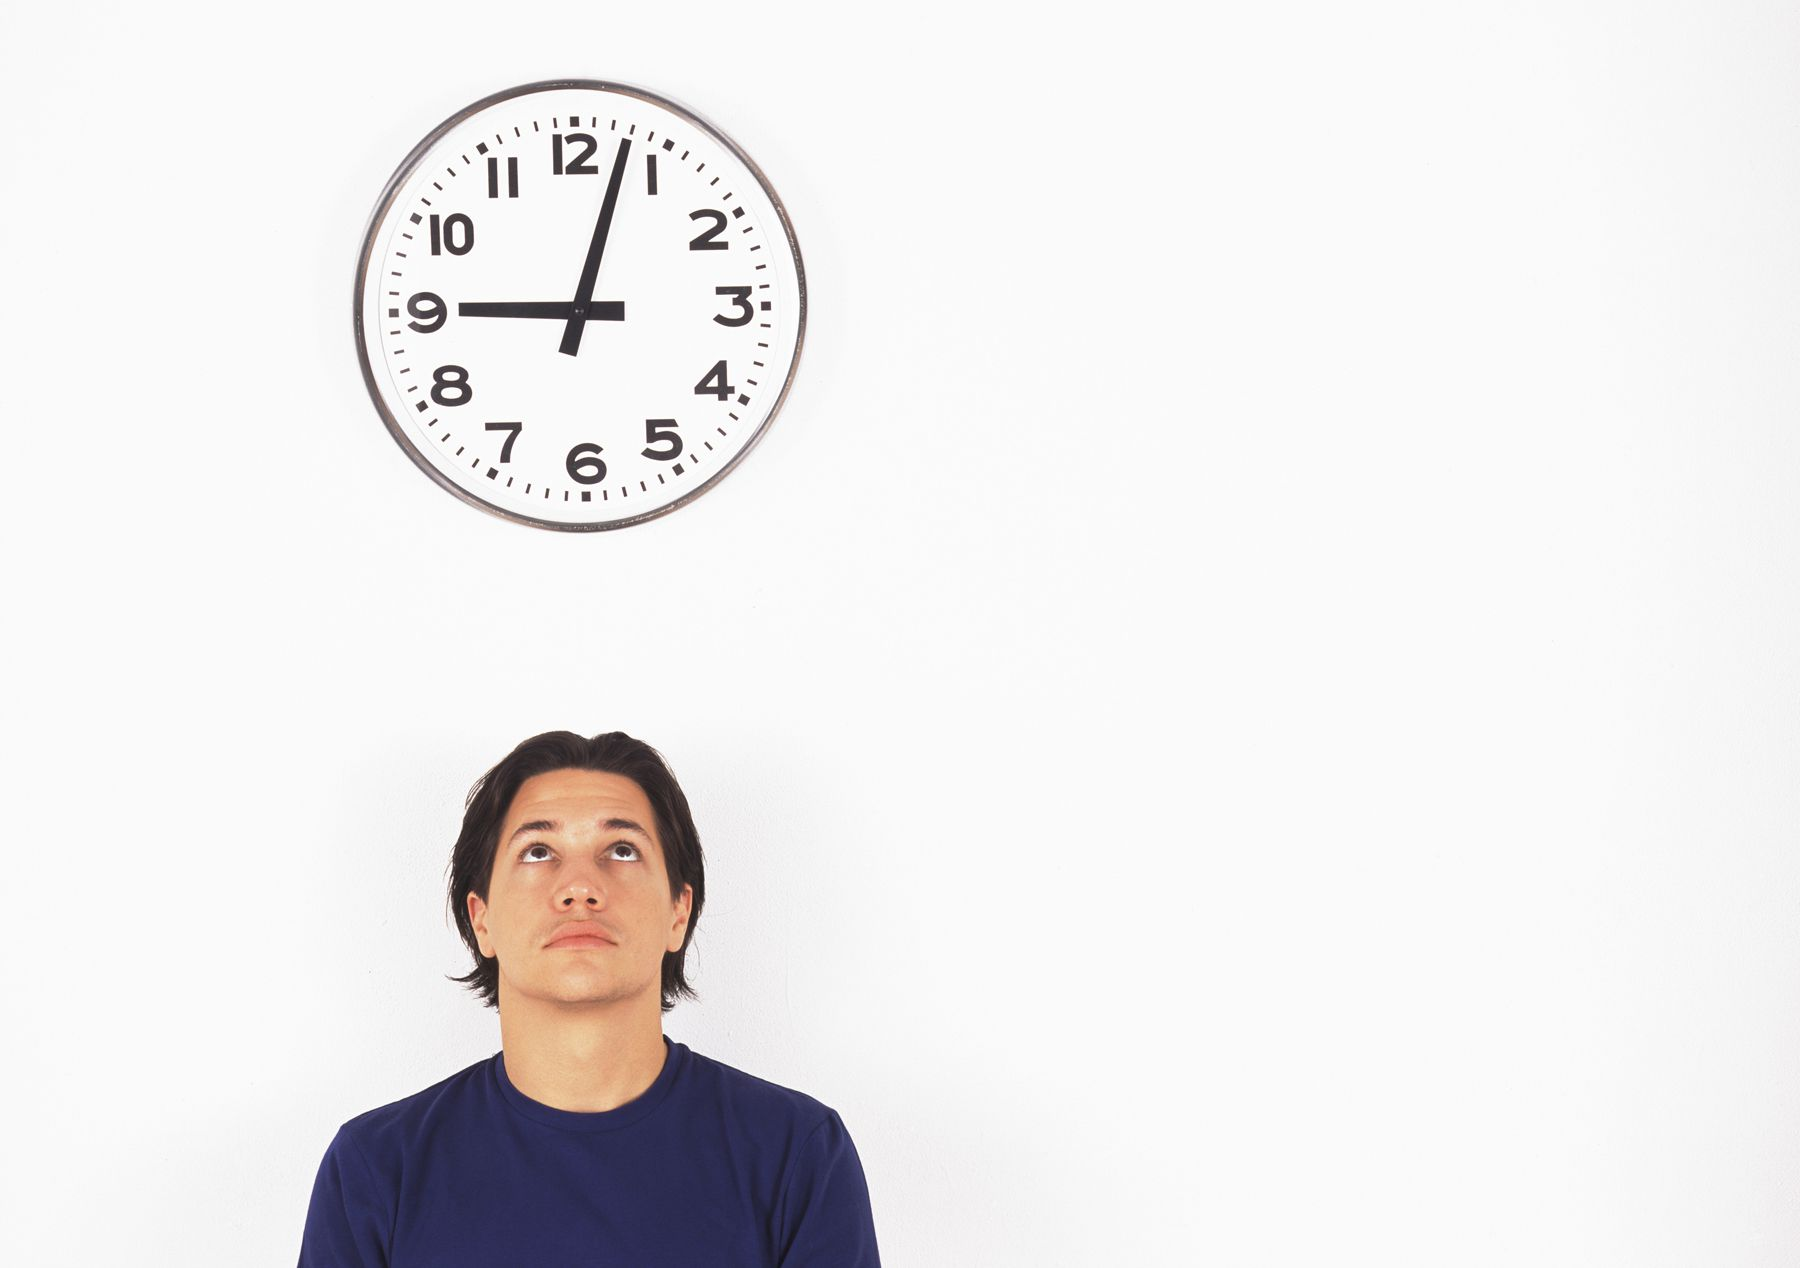 Man waiting under clock